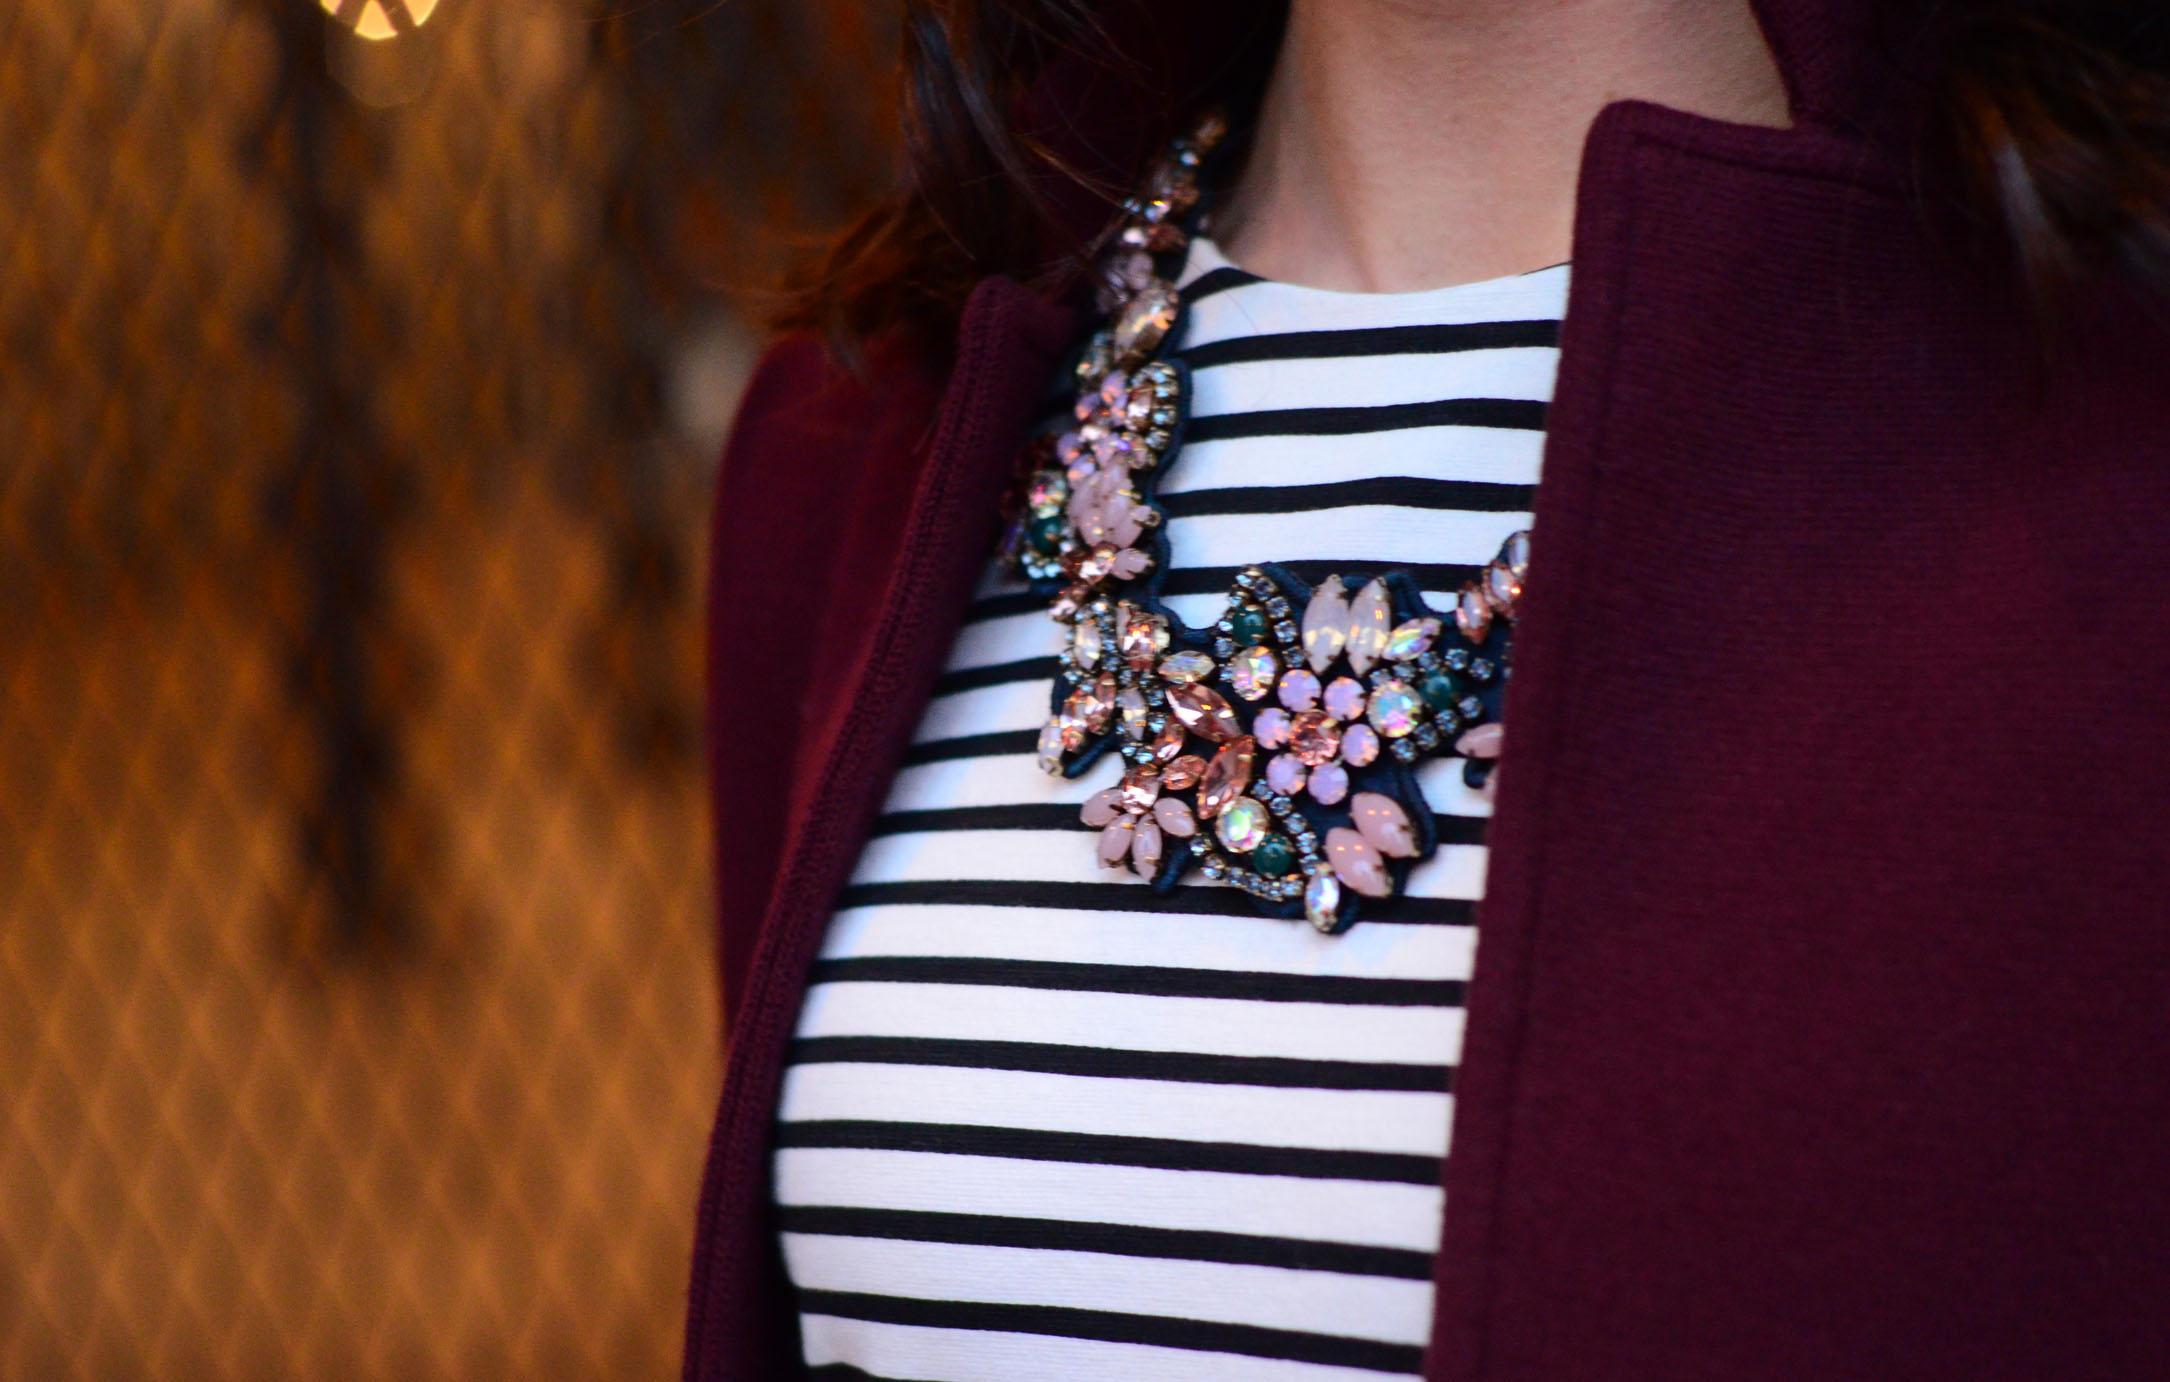 women-i-work-with-target-jen-scully-stripe-shirt-maroon-blazer-necklace